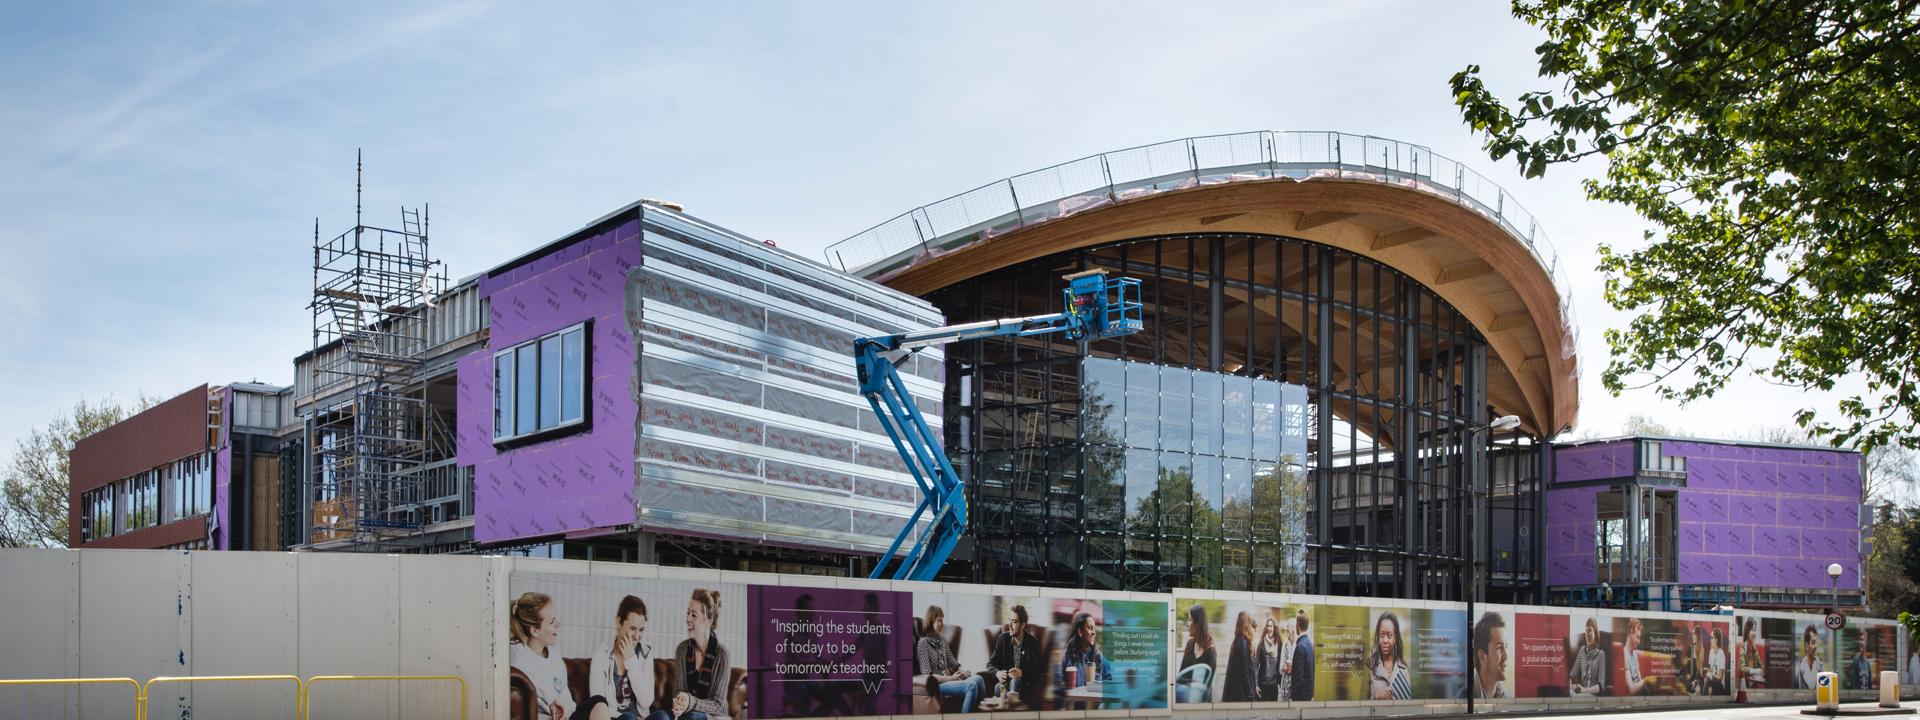 University of Warwick - Chancellor's International Scholarship